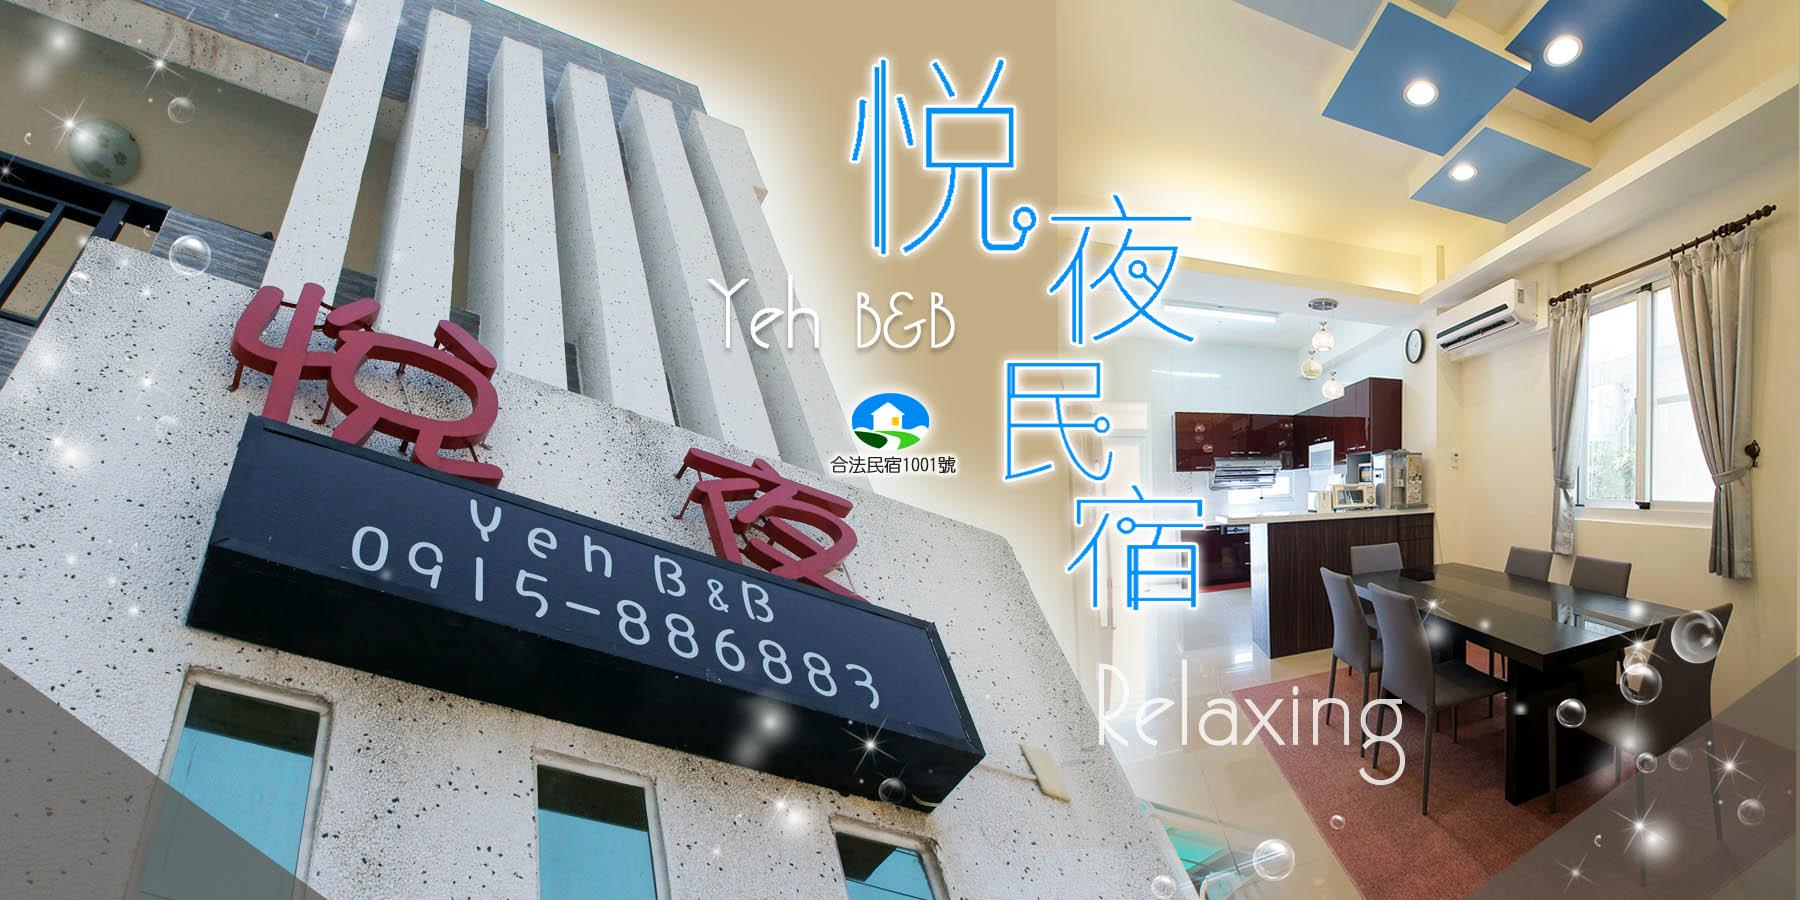 http://yueye.yoyotaitung.com.tw/